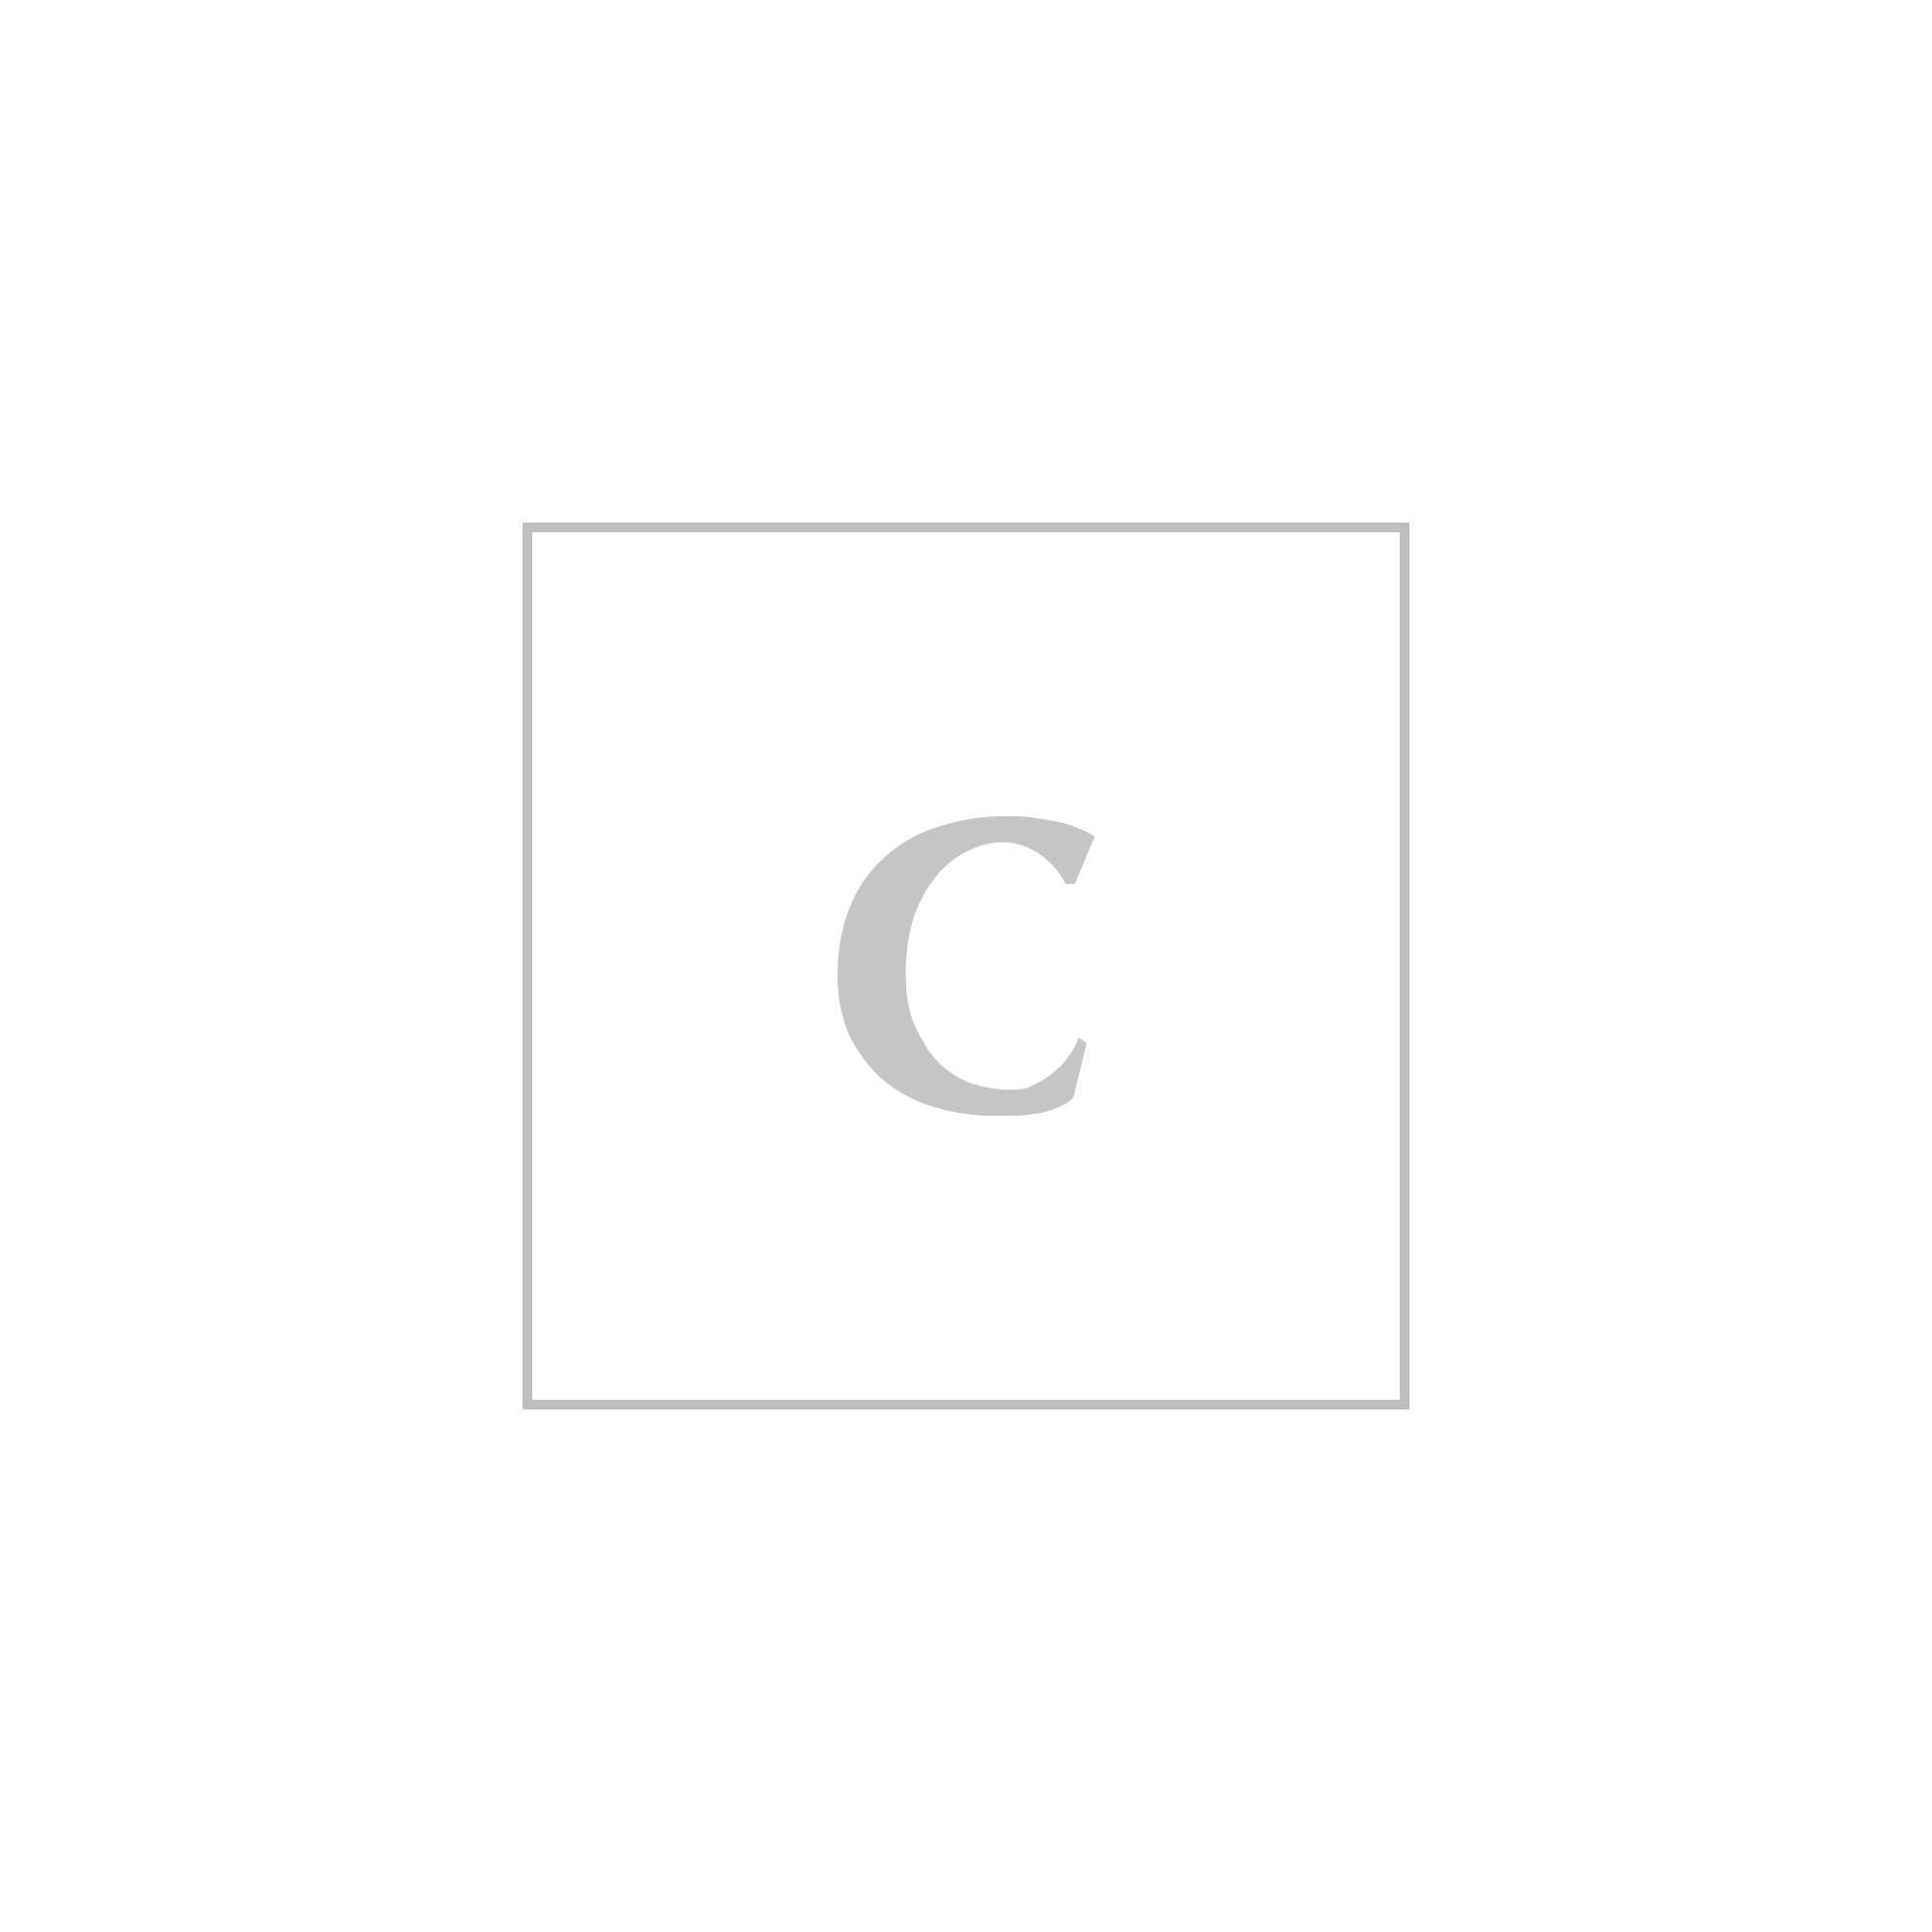 new styles 2eec3 b8d76 Moncler Basic Giacconi da Uomo Blu